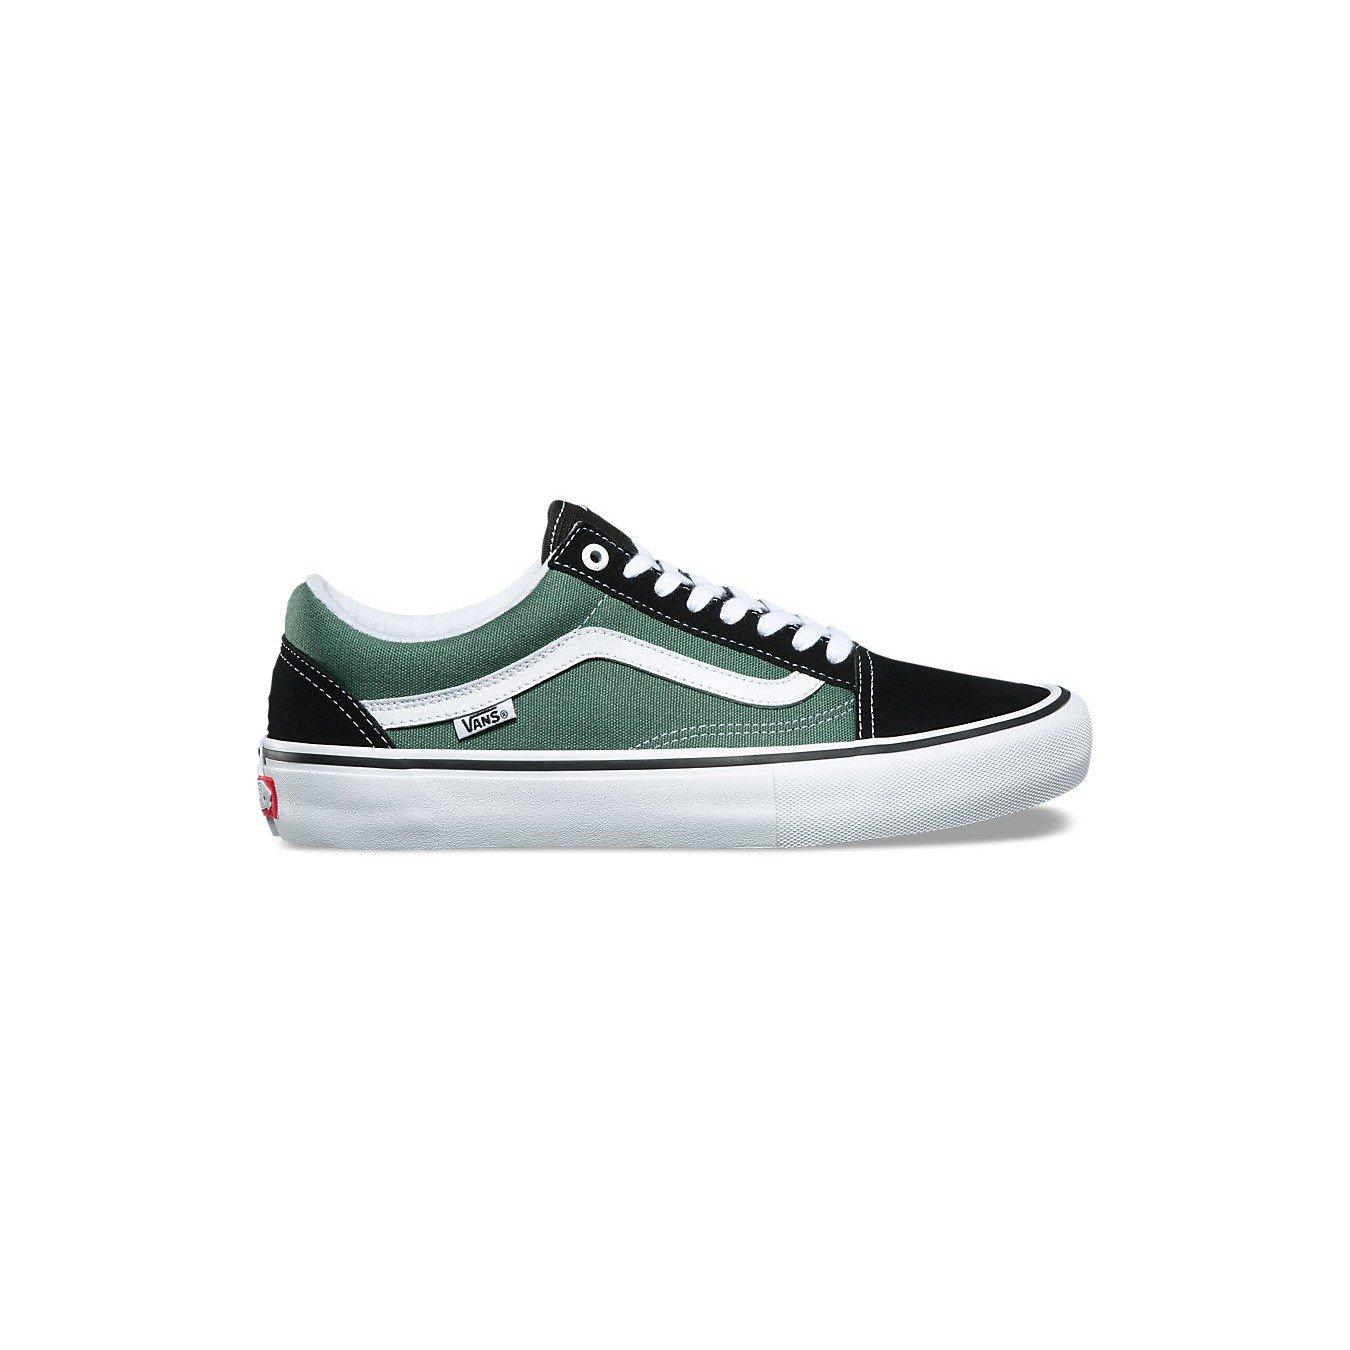 Vans Old Skool Pro Shoes - Black/Duck